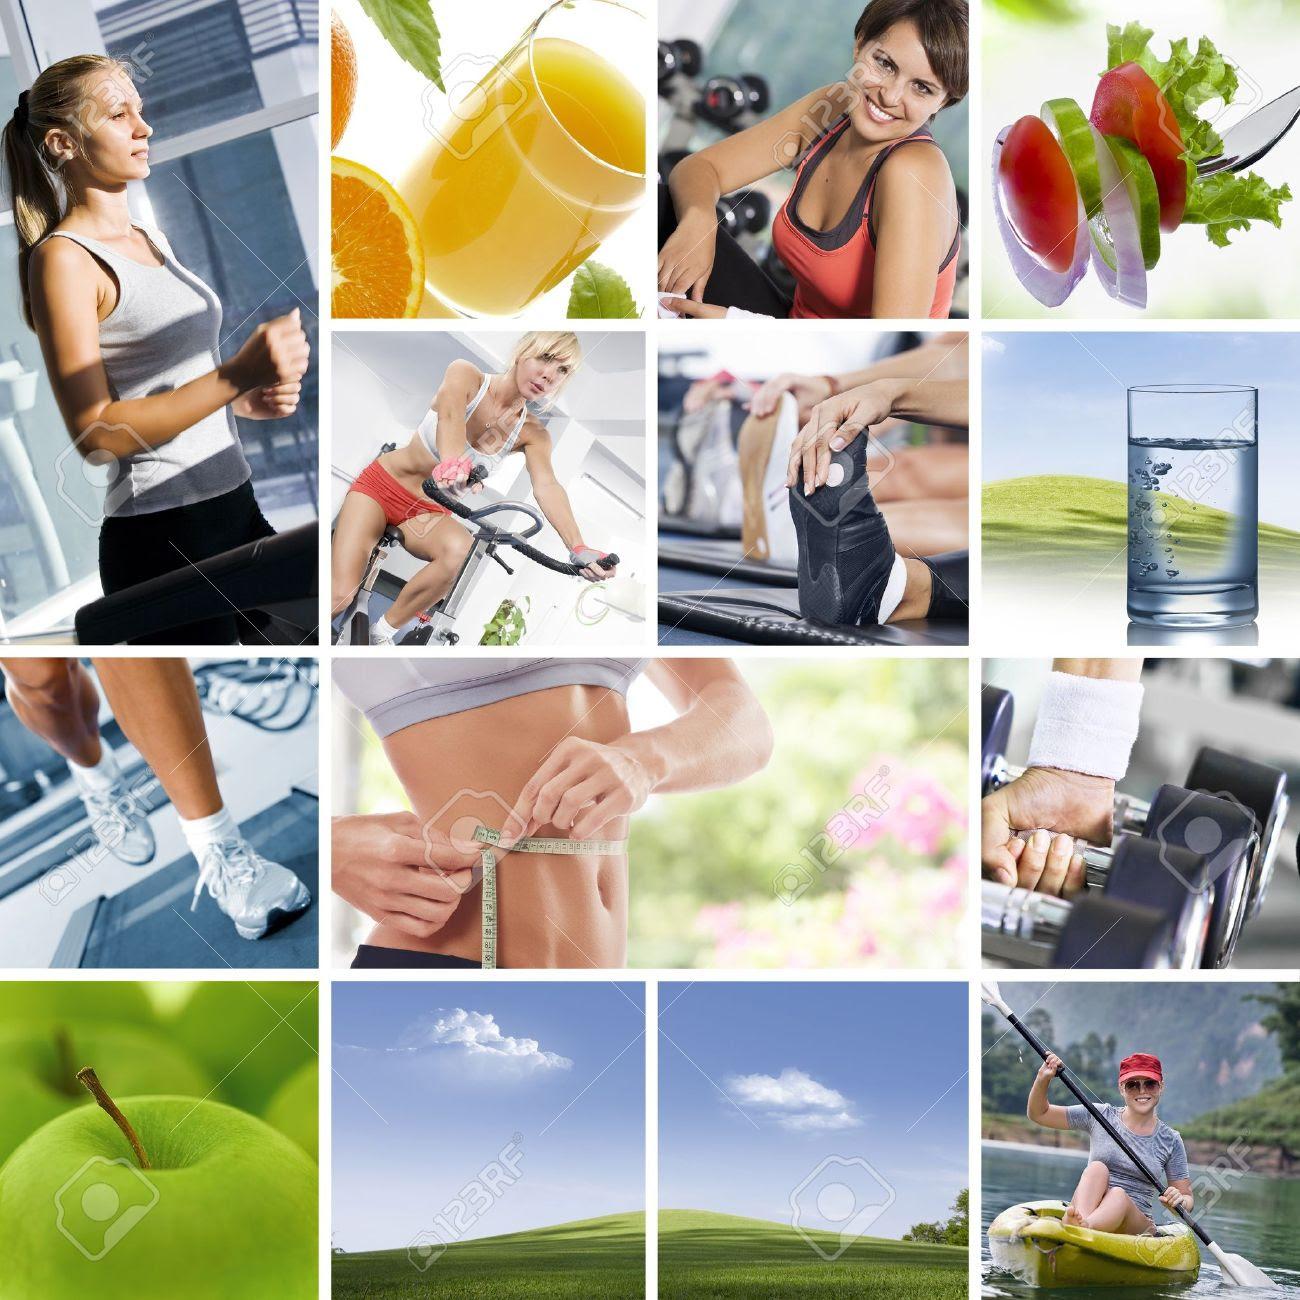 http://previews.123rf.com/images/ersler/ersler1101/ersler110100135/8627643-Collage-de-tema-de-estilo-de-vida-saludable-compuesto-de-im-genes-diferentes-Foto-de-archivo.jpg